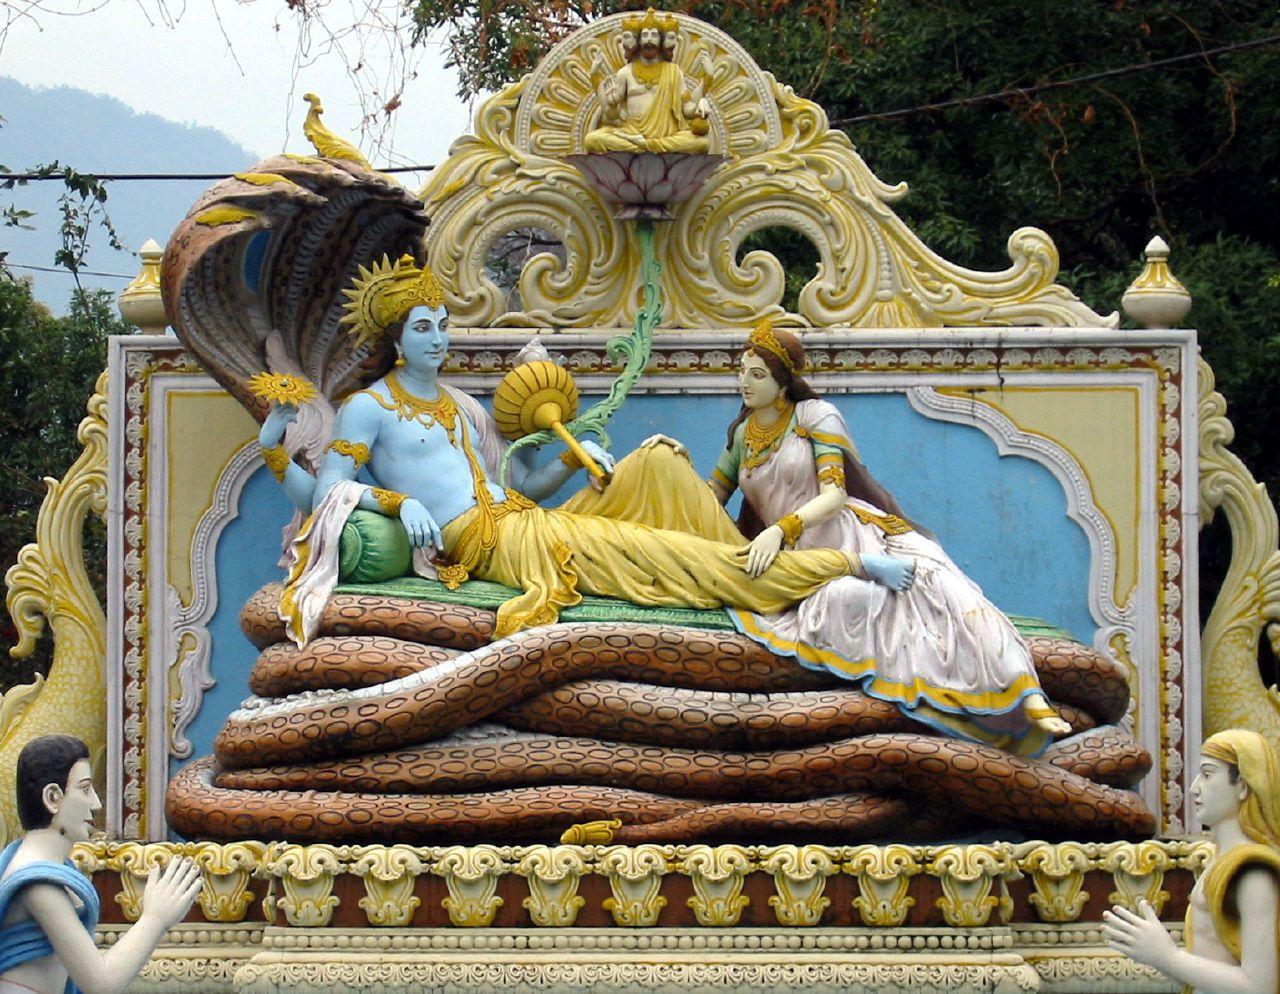 Lord Sudharshana is a manifestation of Lord Vishnu and the Maha Sudarshana Mantra is dedicated to him